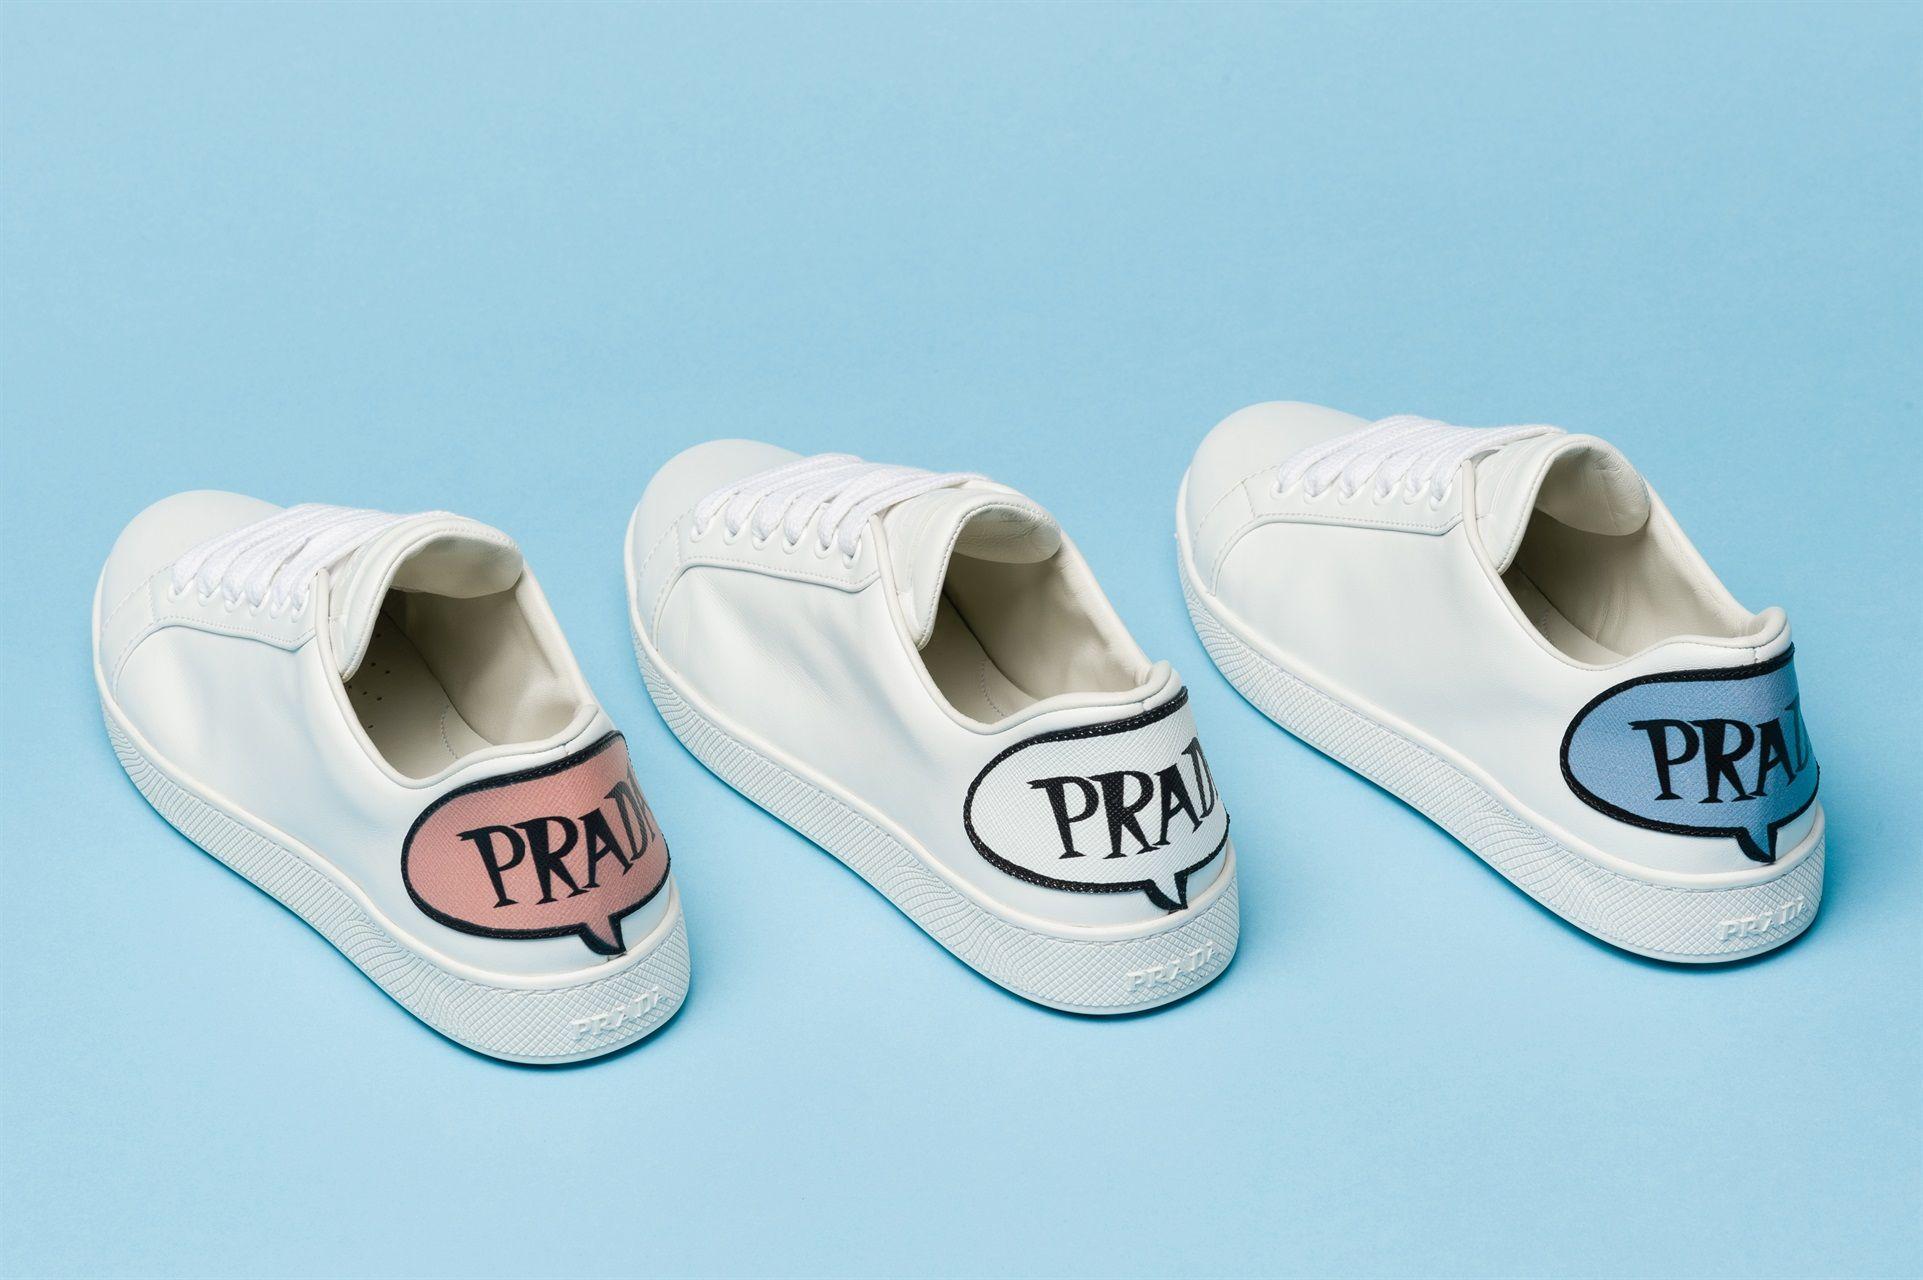 Prada Prada Chaussures Fumetto lRZ1yf3D